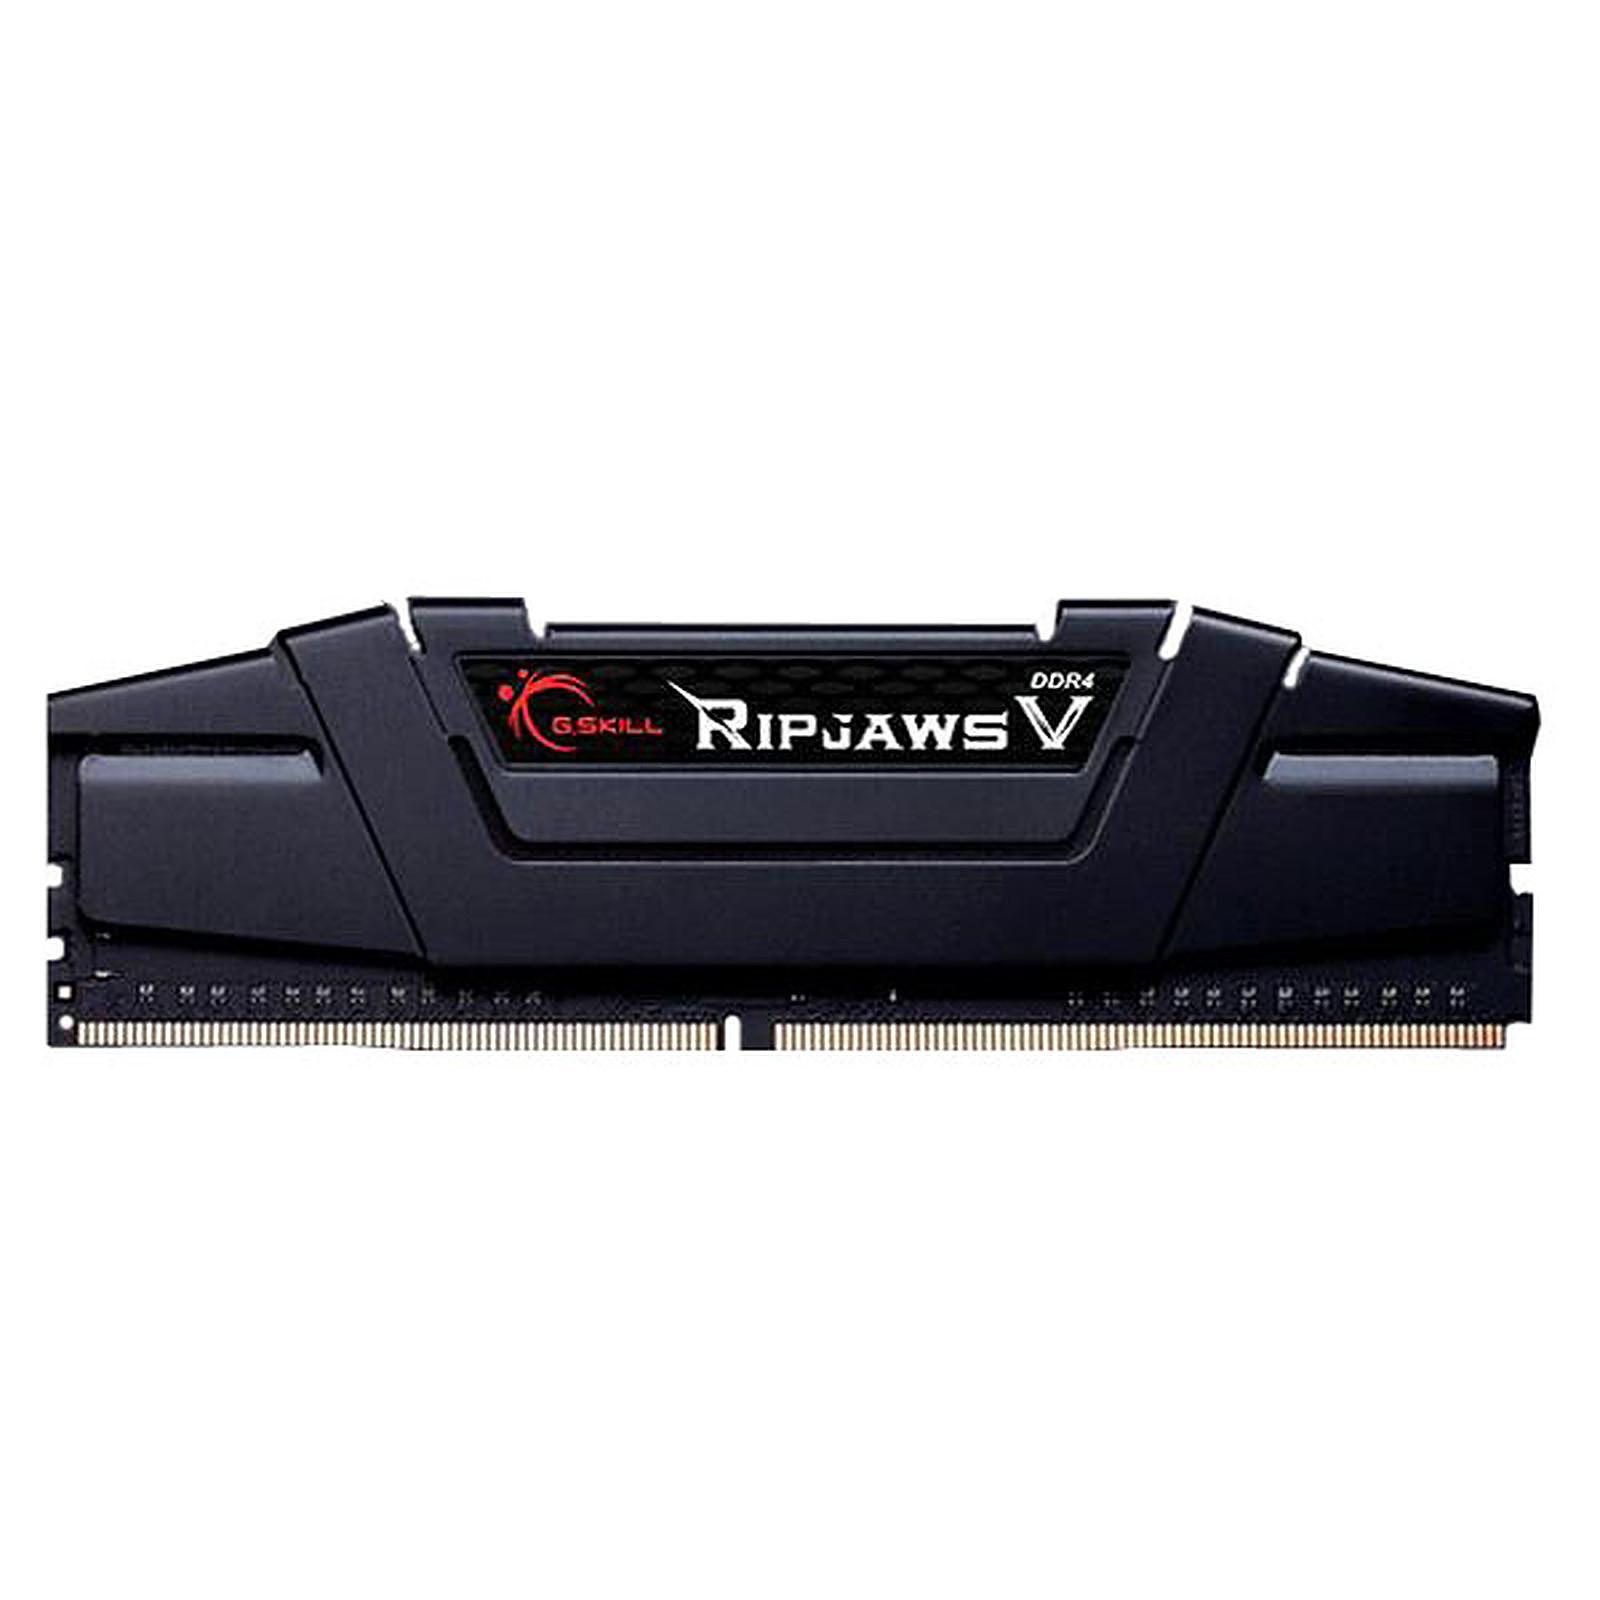 G.Skill RipJaws 5 Series Noir 32 Go (1 x 32 Go) DDR4 2666 MHz CL18